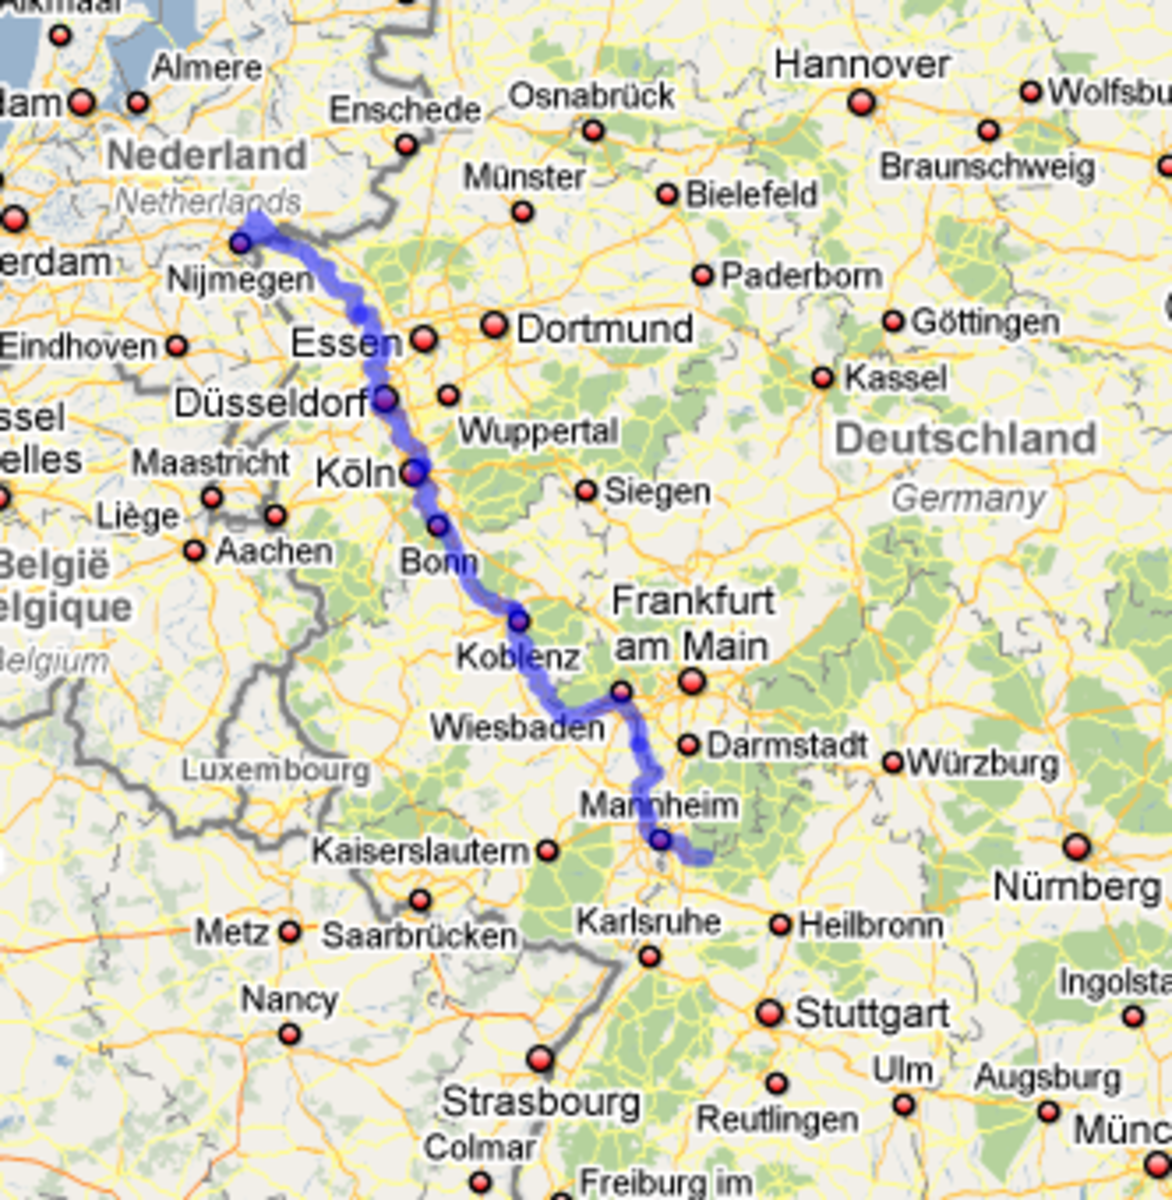 From Nijmegen to Heidelberg